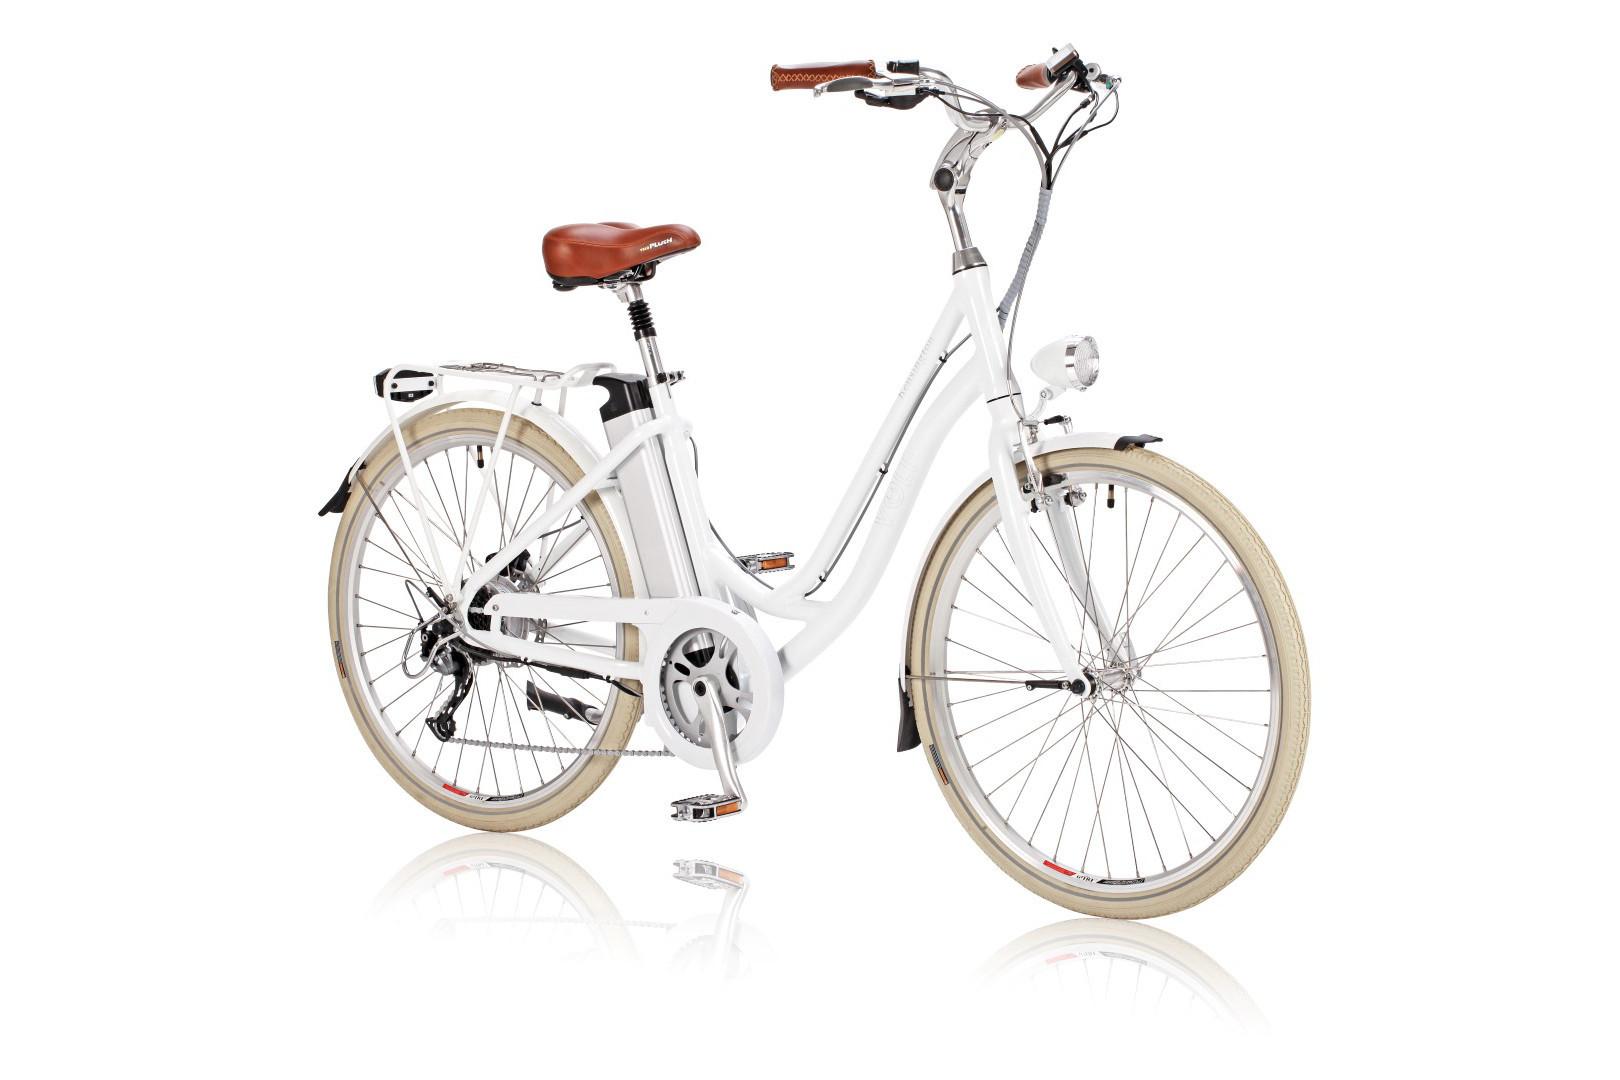 a9eca6fb149 VOLT™ Kensington White Step Through Electric Bicycle